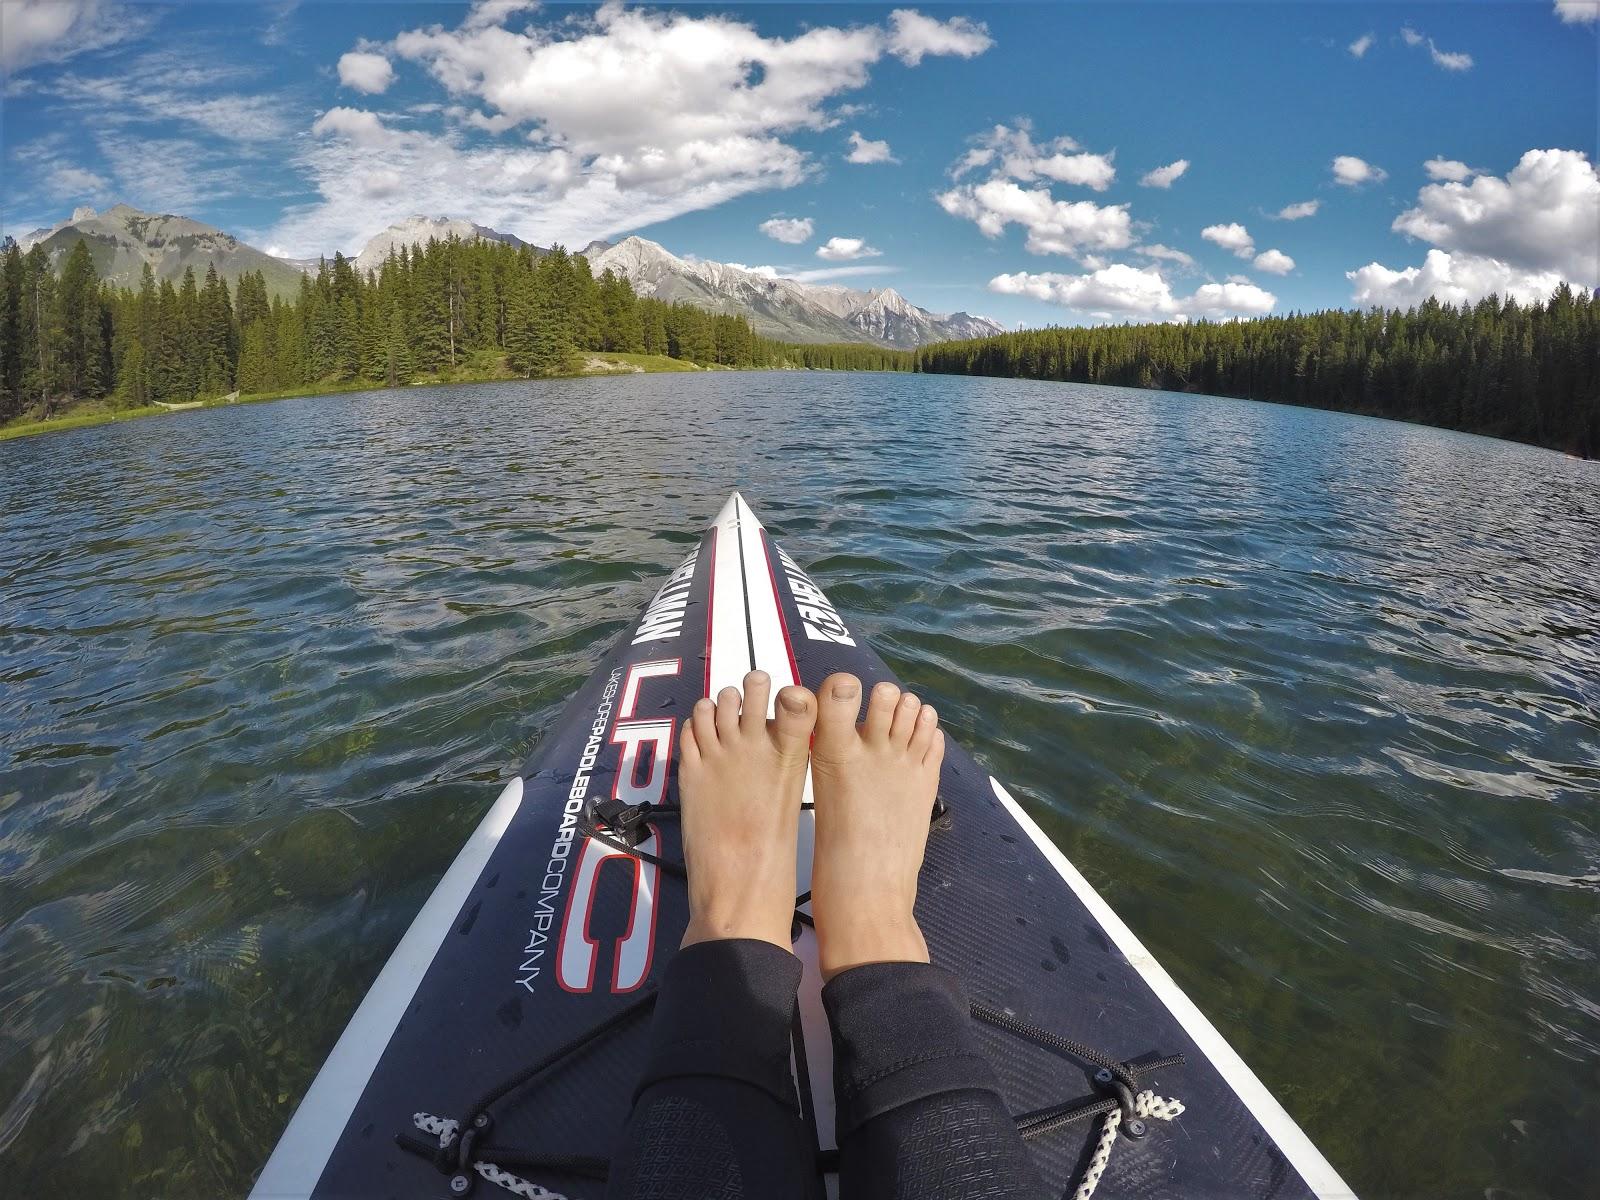 Stand-up paddle boarding at Johnson Lake, Banff